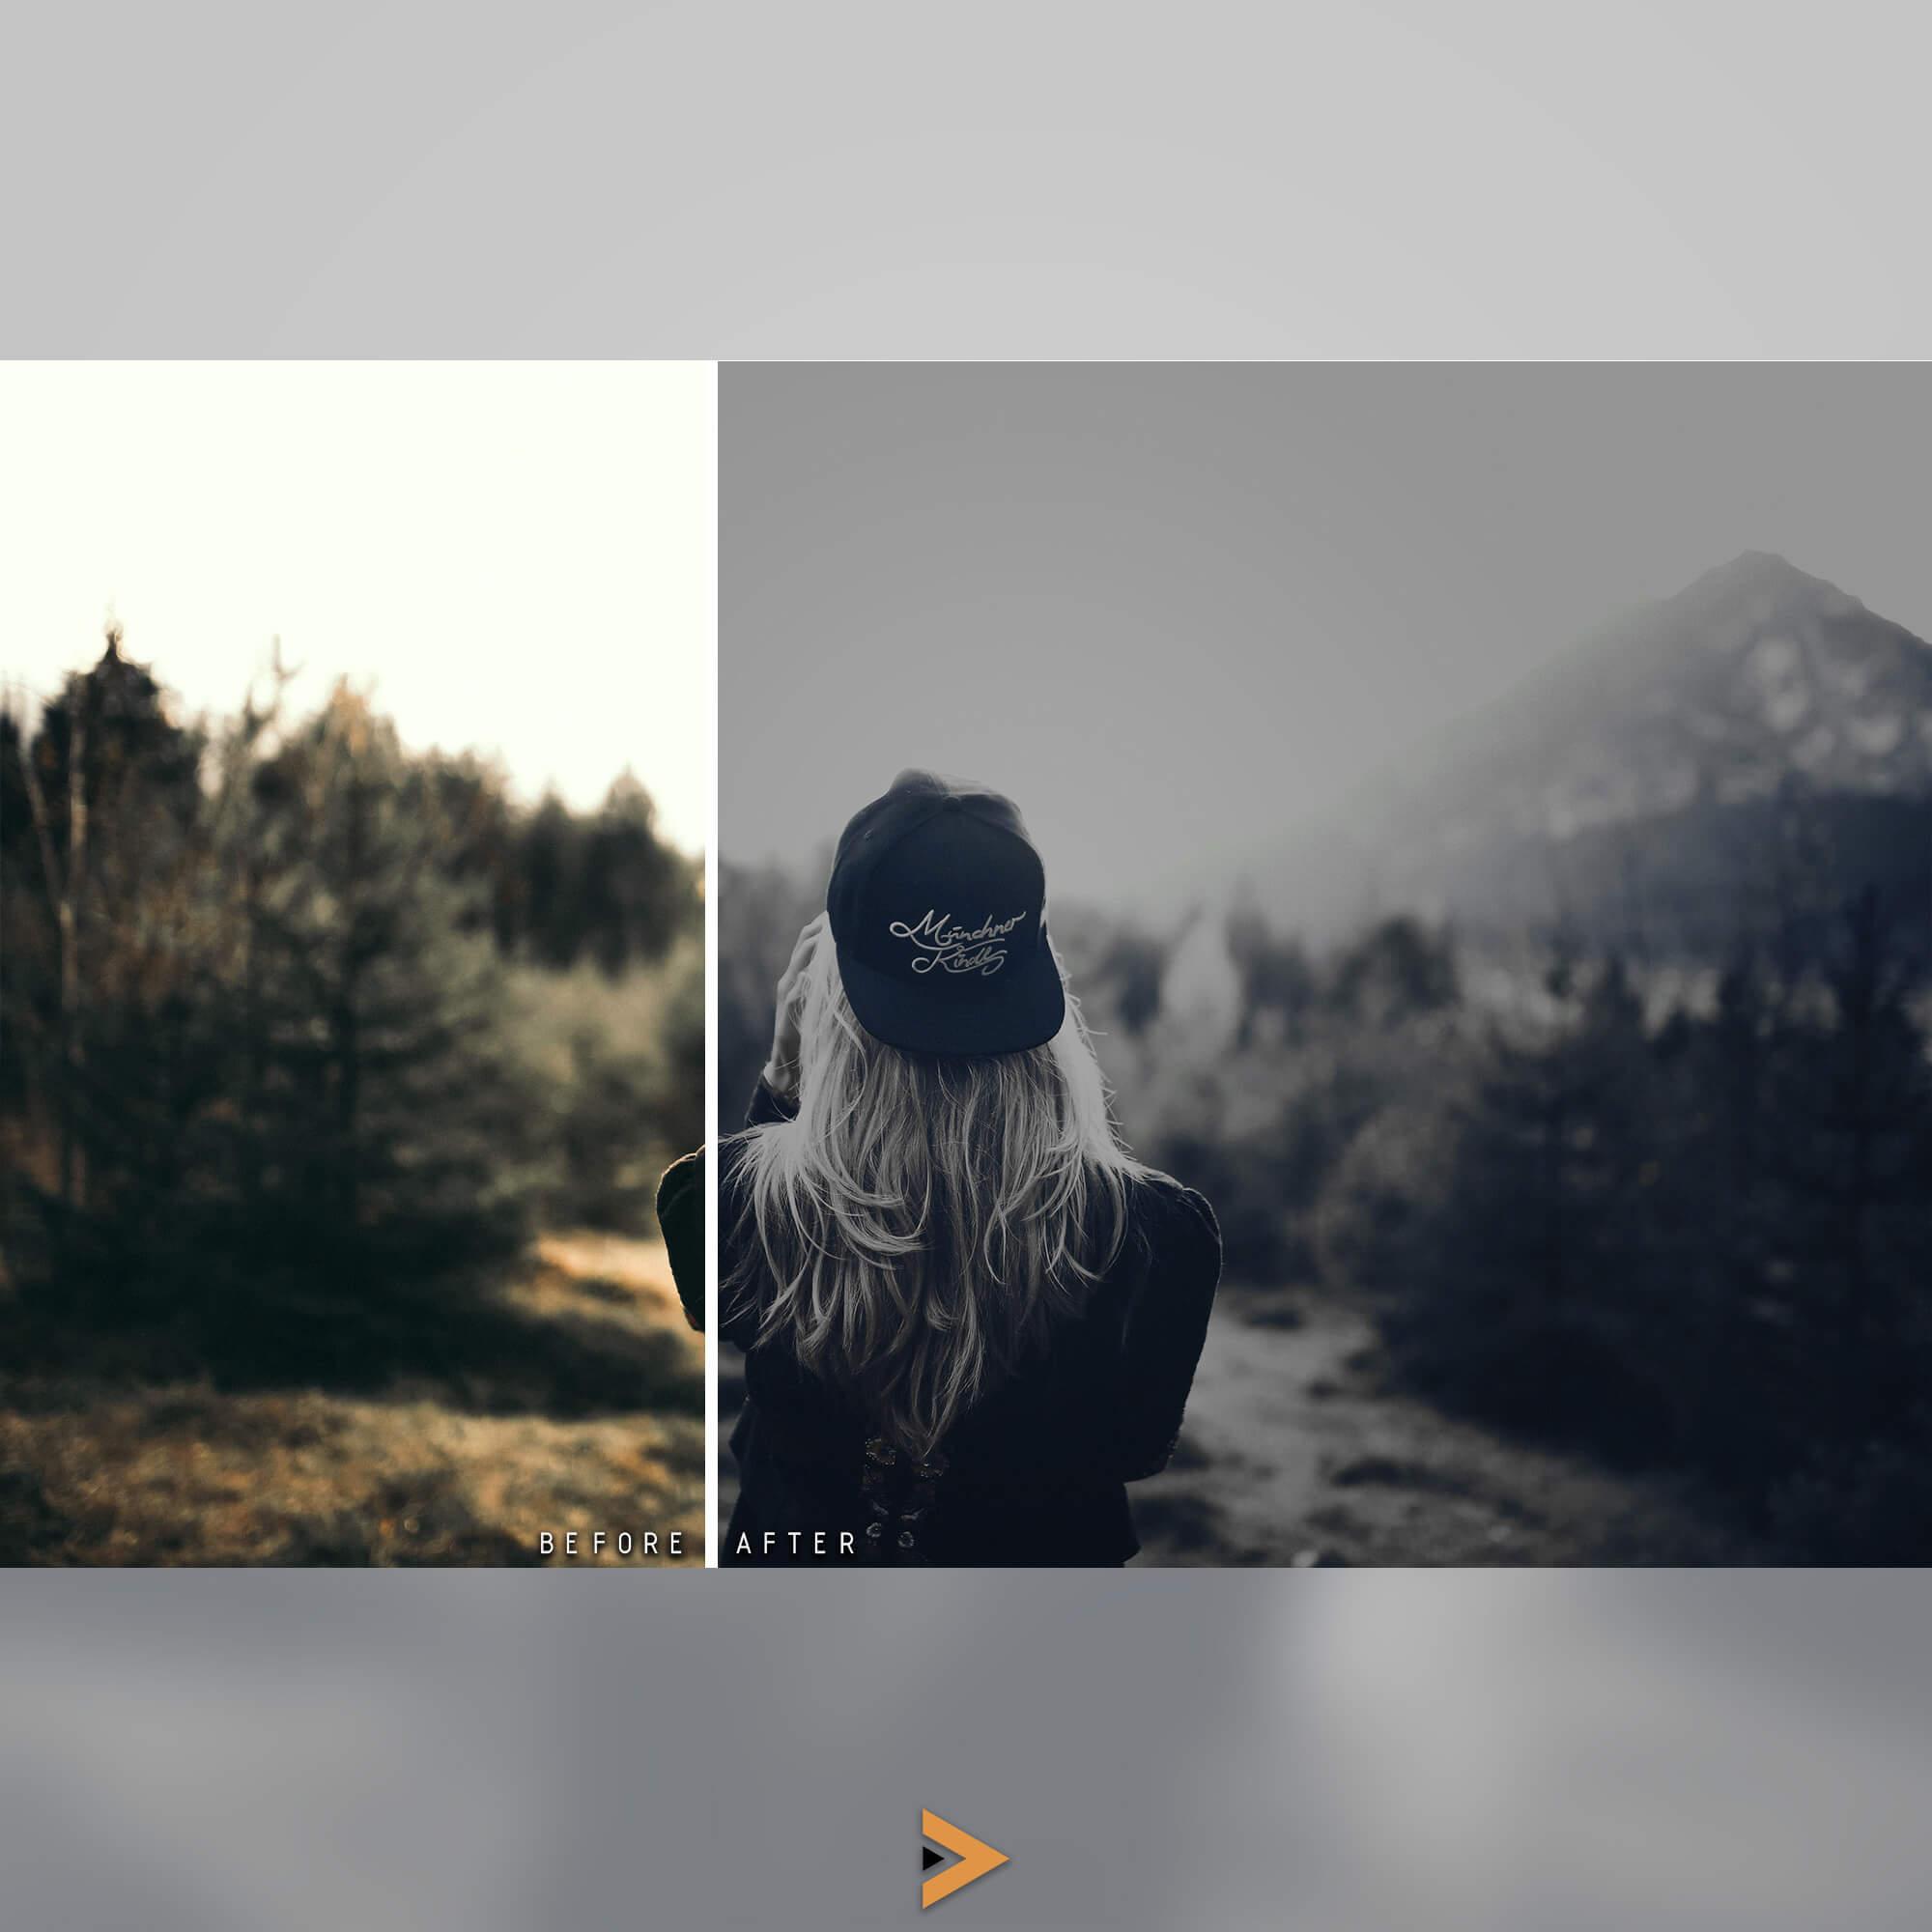 affinity photo presets